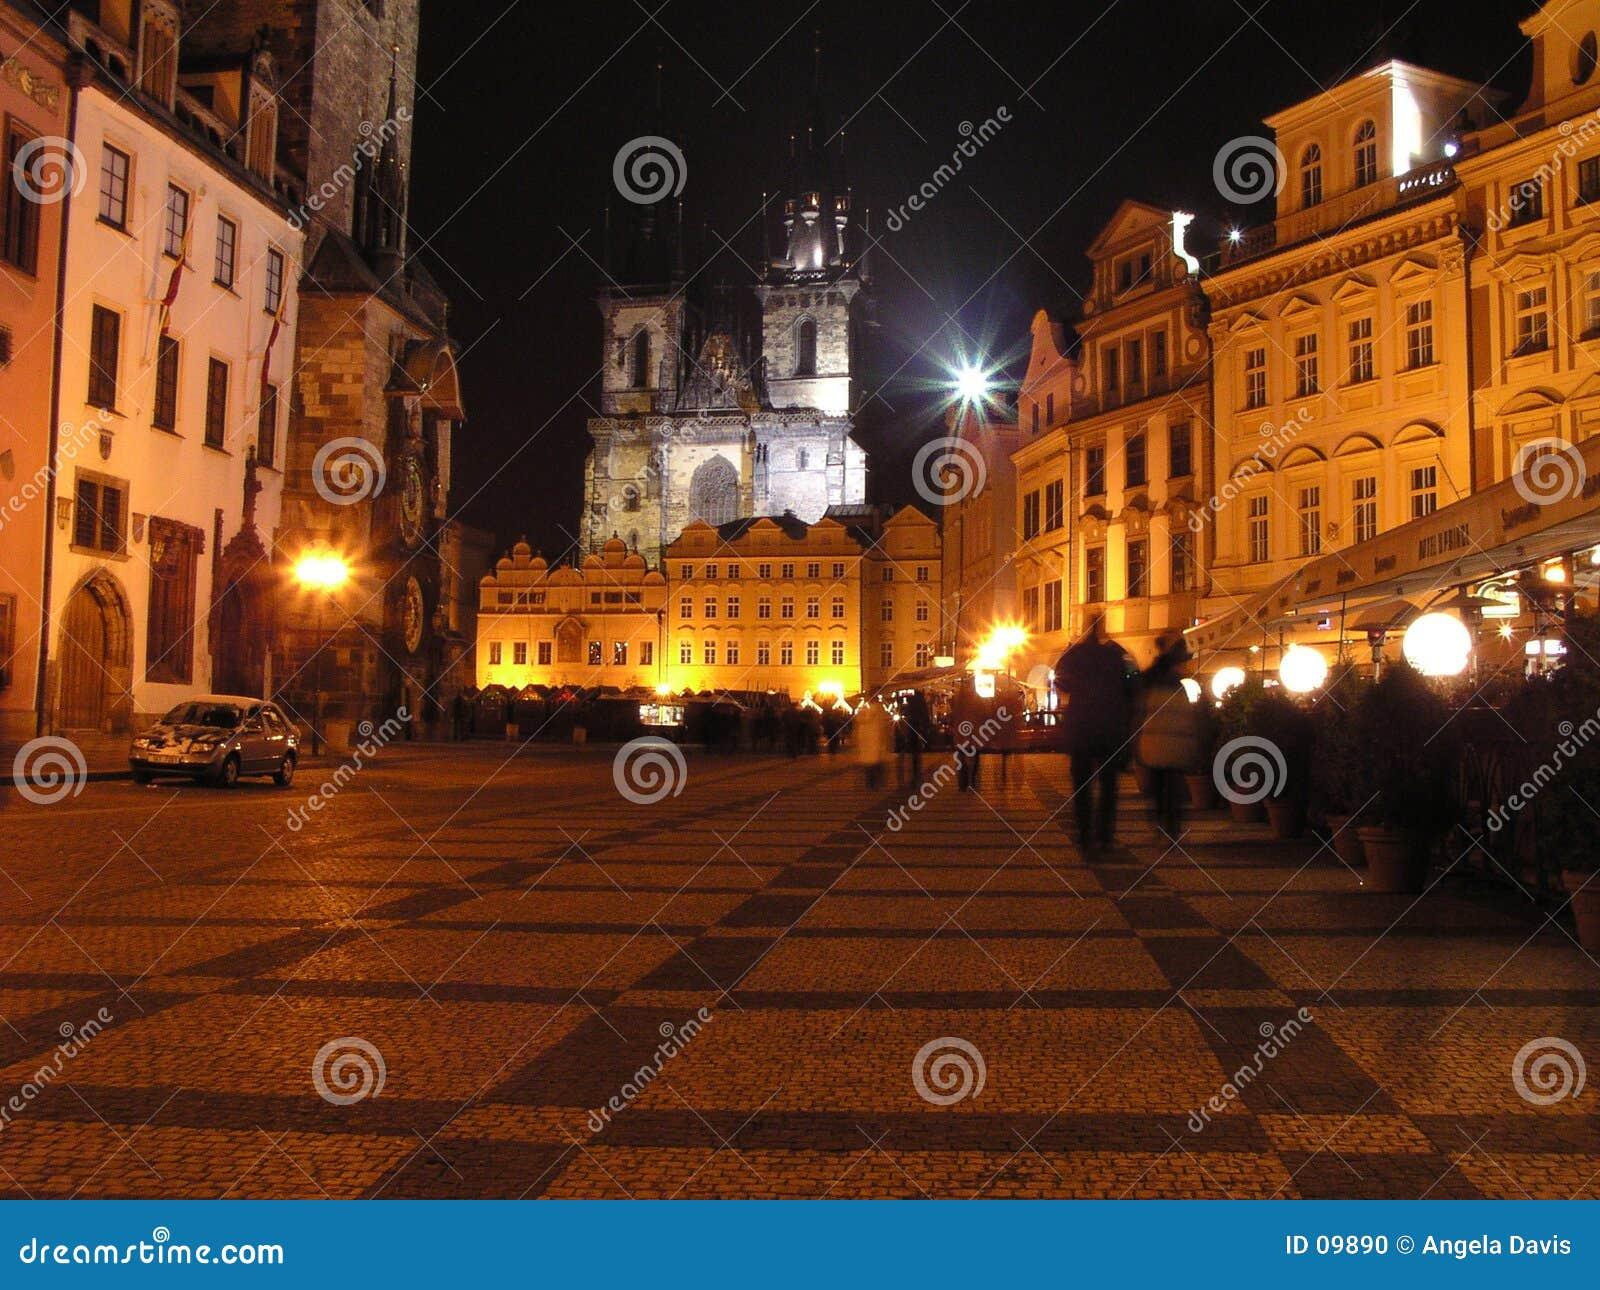 1 czech prague republic square